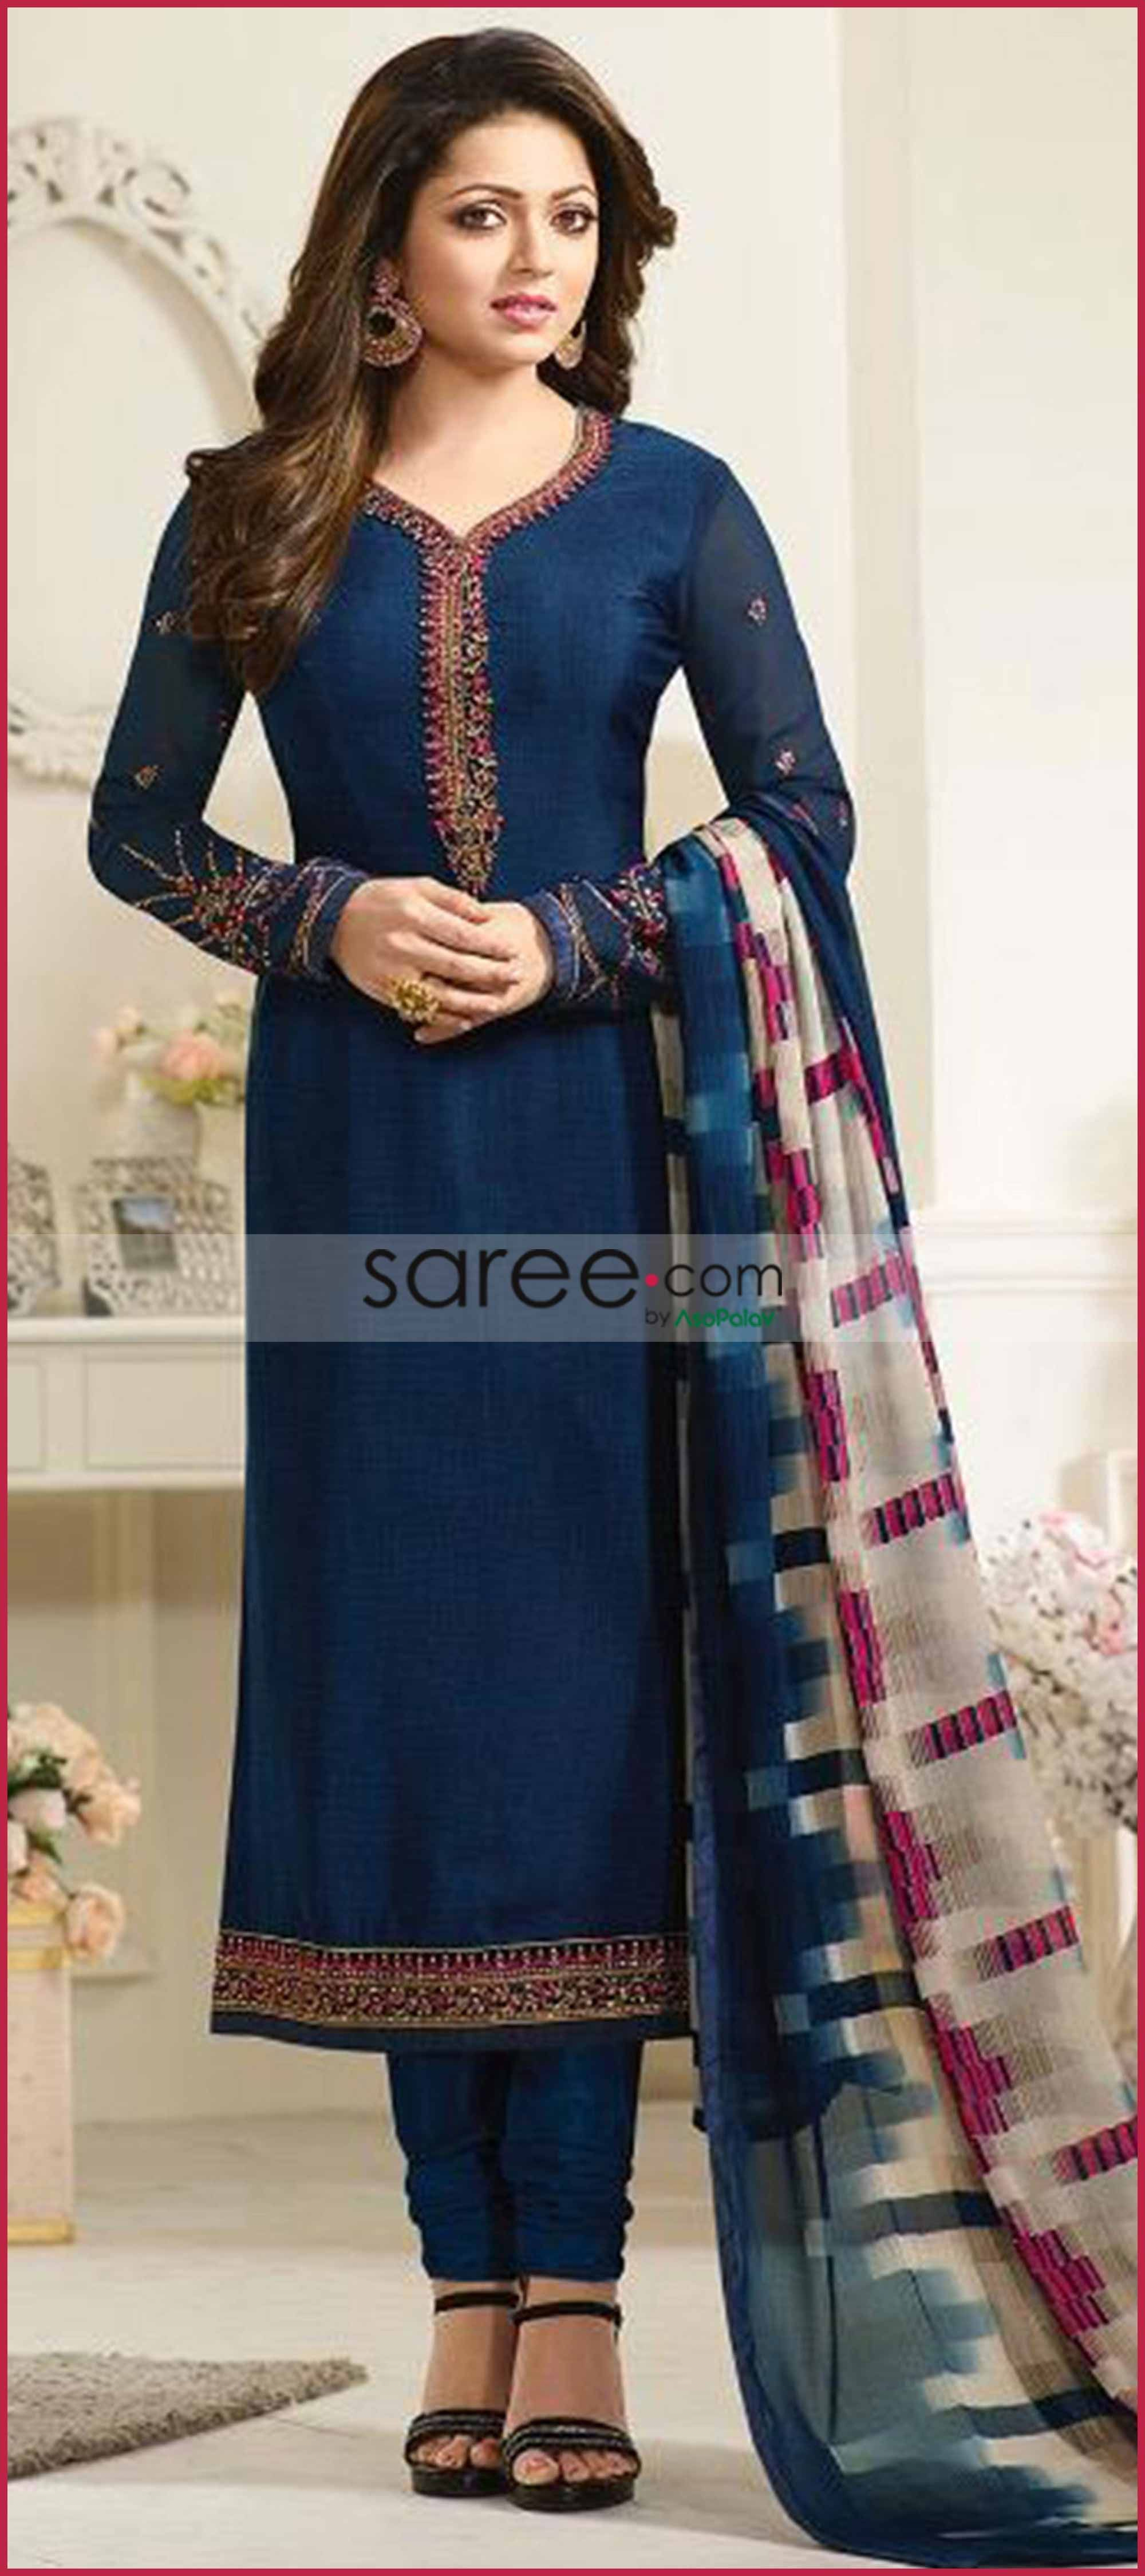 f7be6e4e9a Drashti Dhami Blue Crepe Suit with Embroidery di 2019 | Beauty - B2 ...